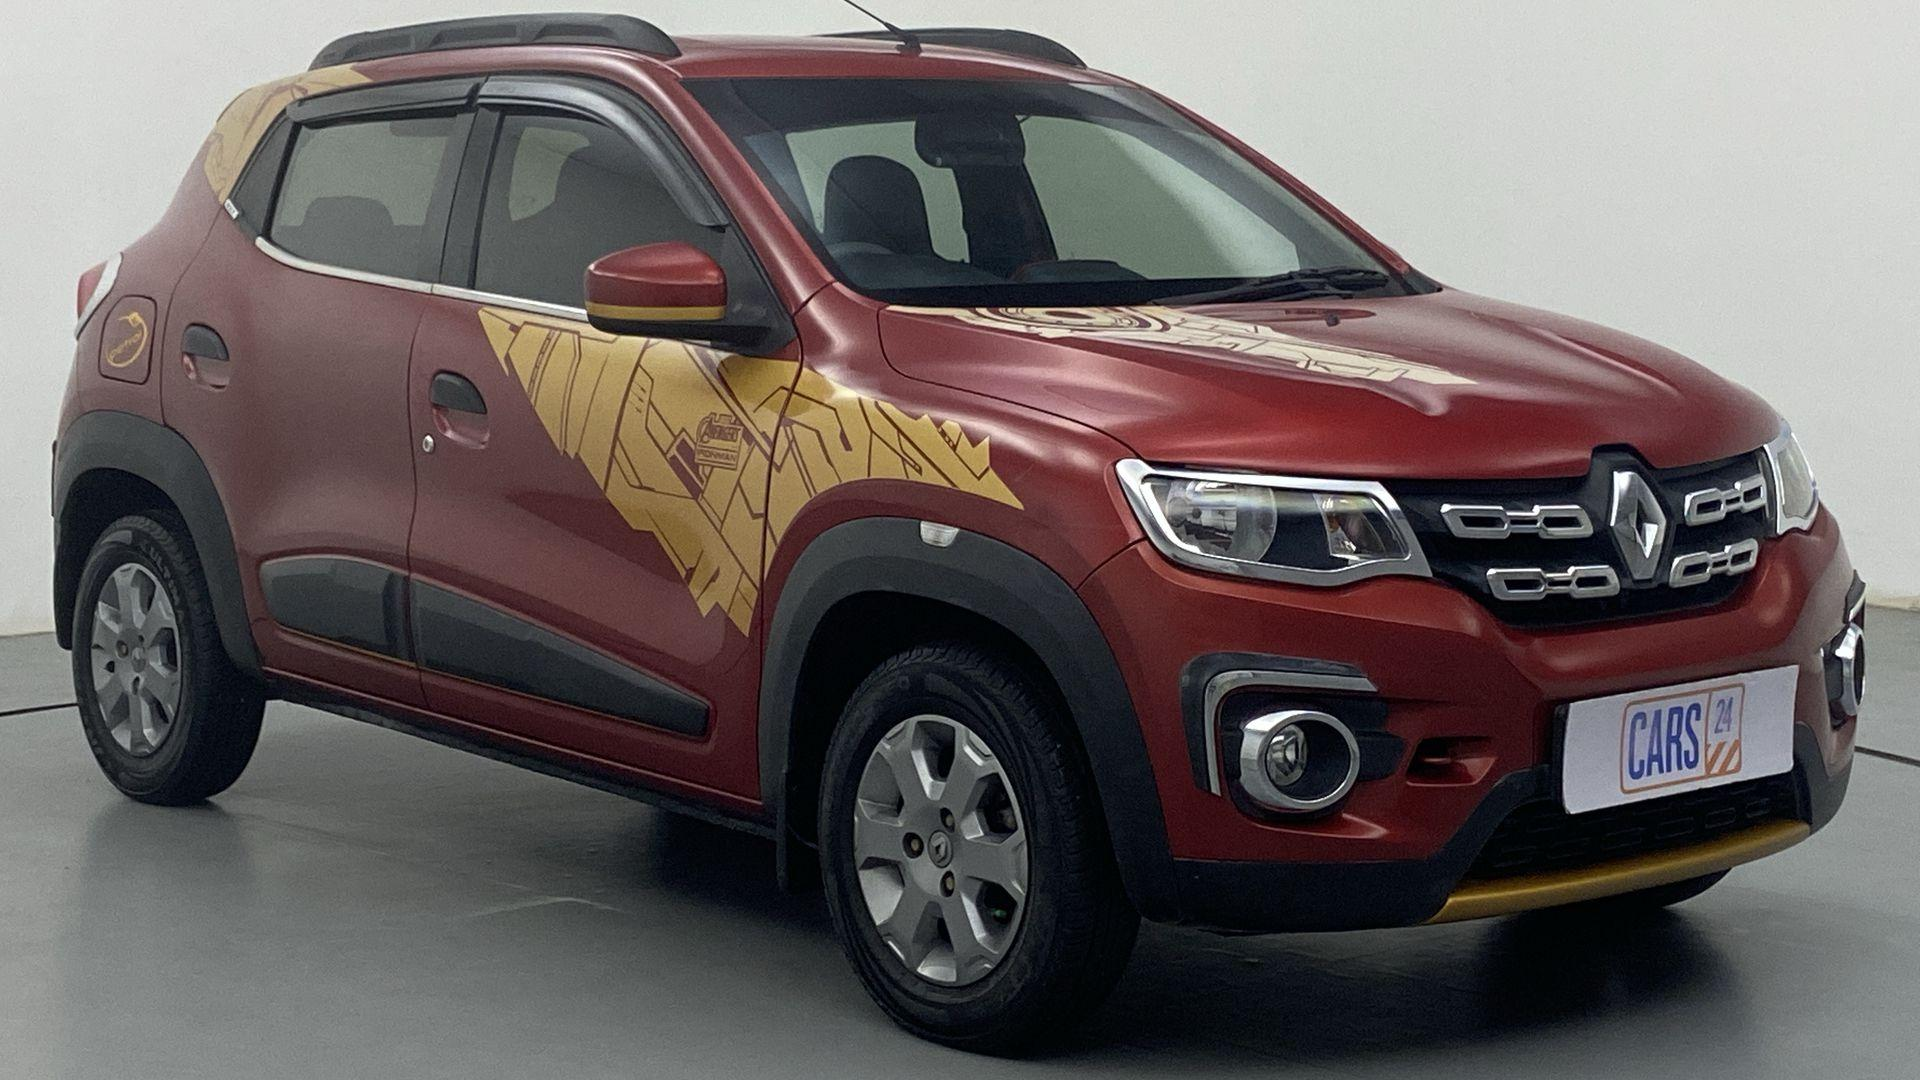 2018 Renault Kwid 1.0 RXT OPT Marvel Edition